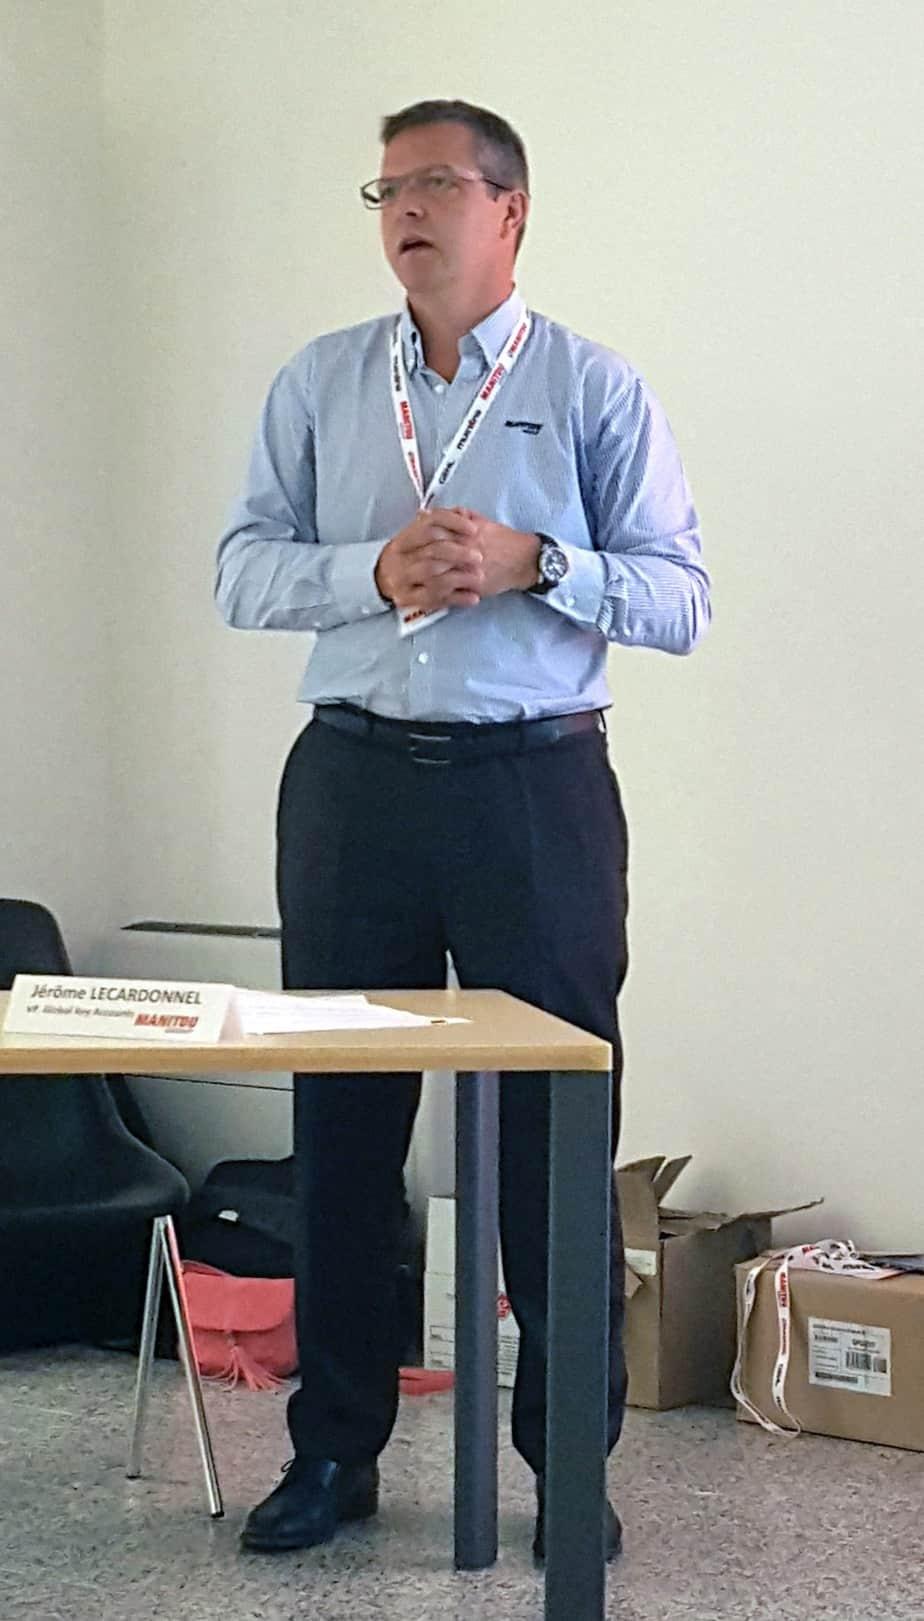 Jerome Lecardonnel, VP Global Key Account